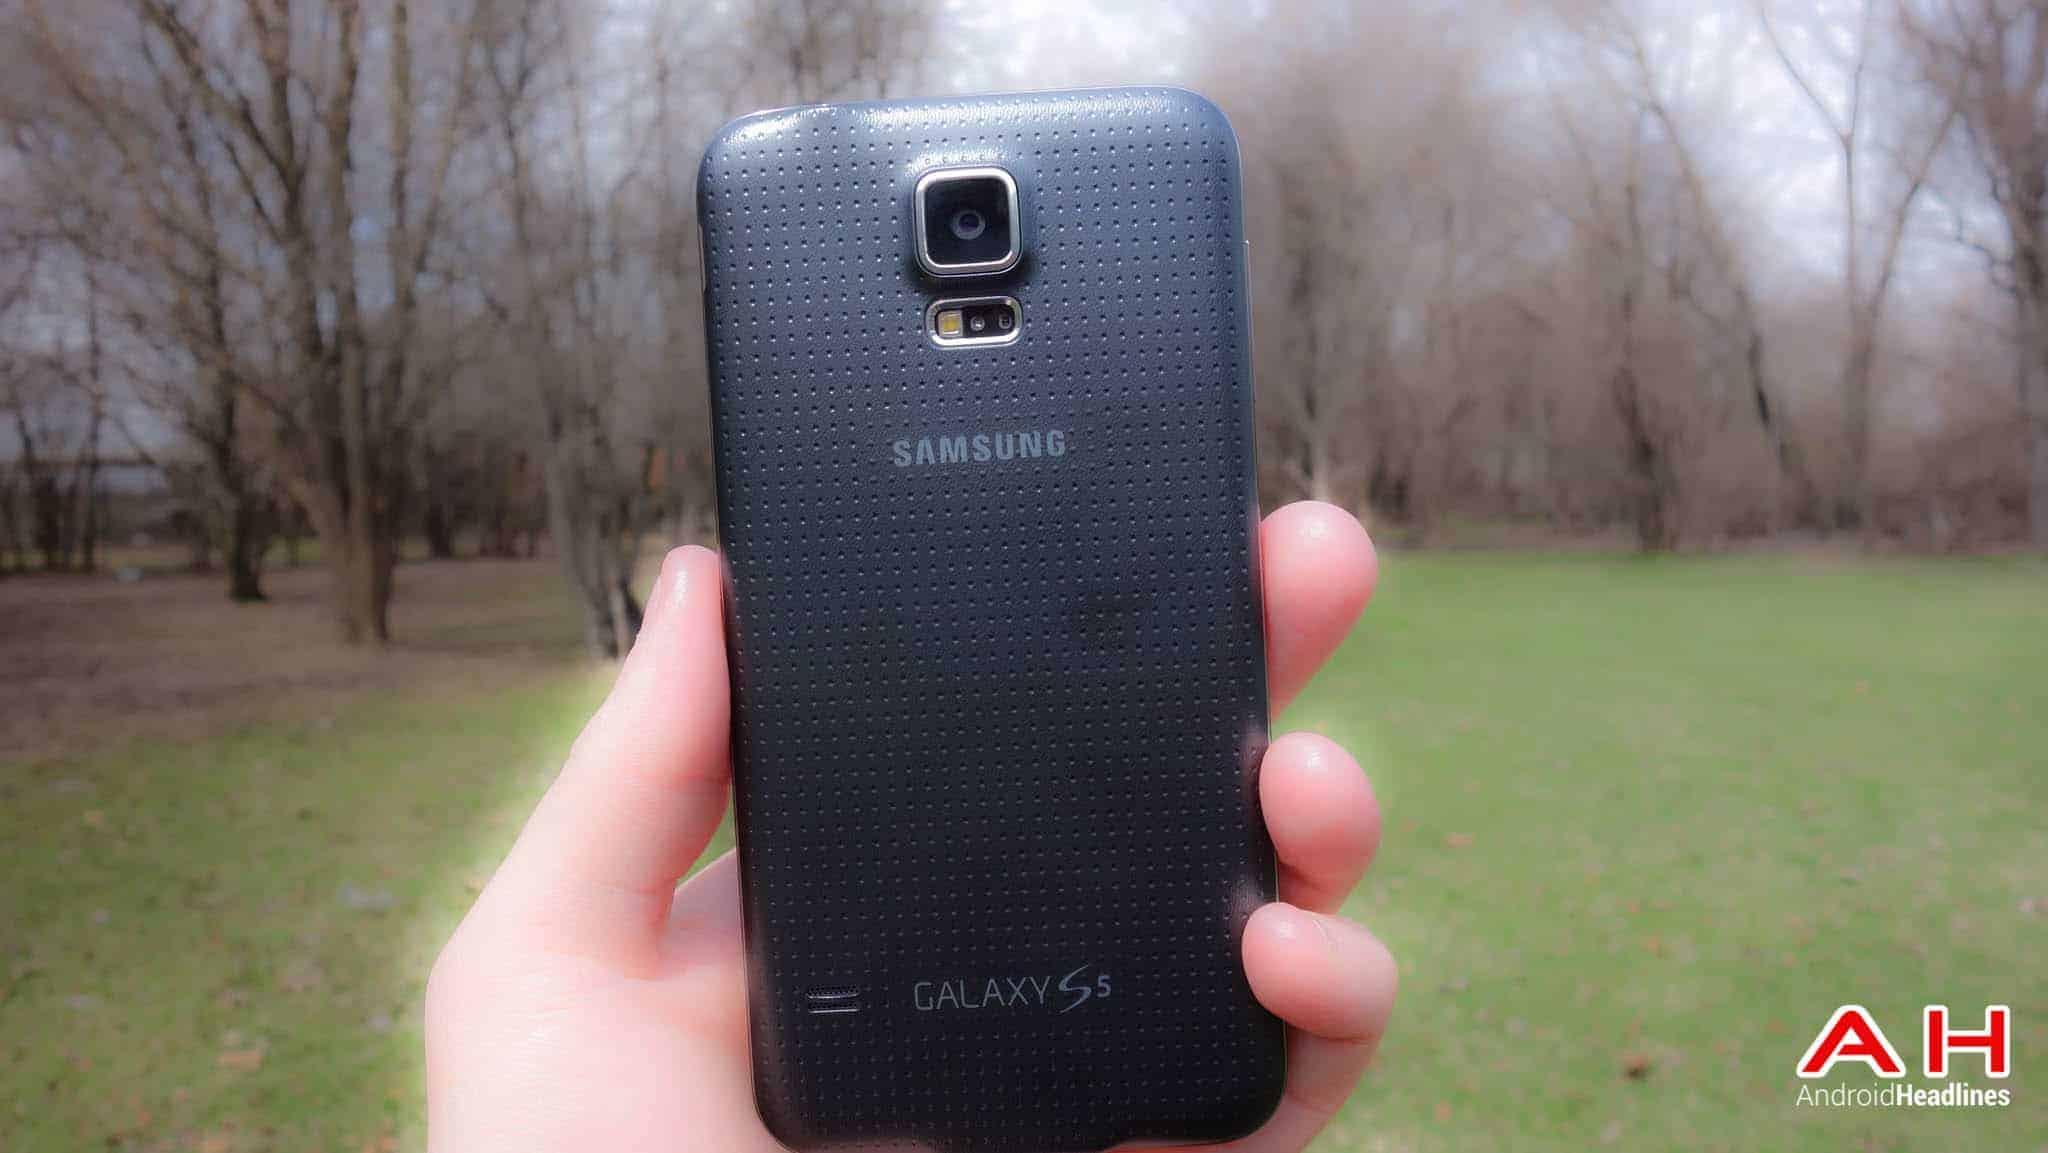 Samsung galaxy s5 ah 10